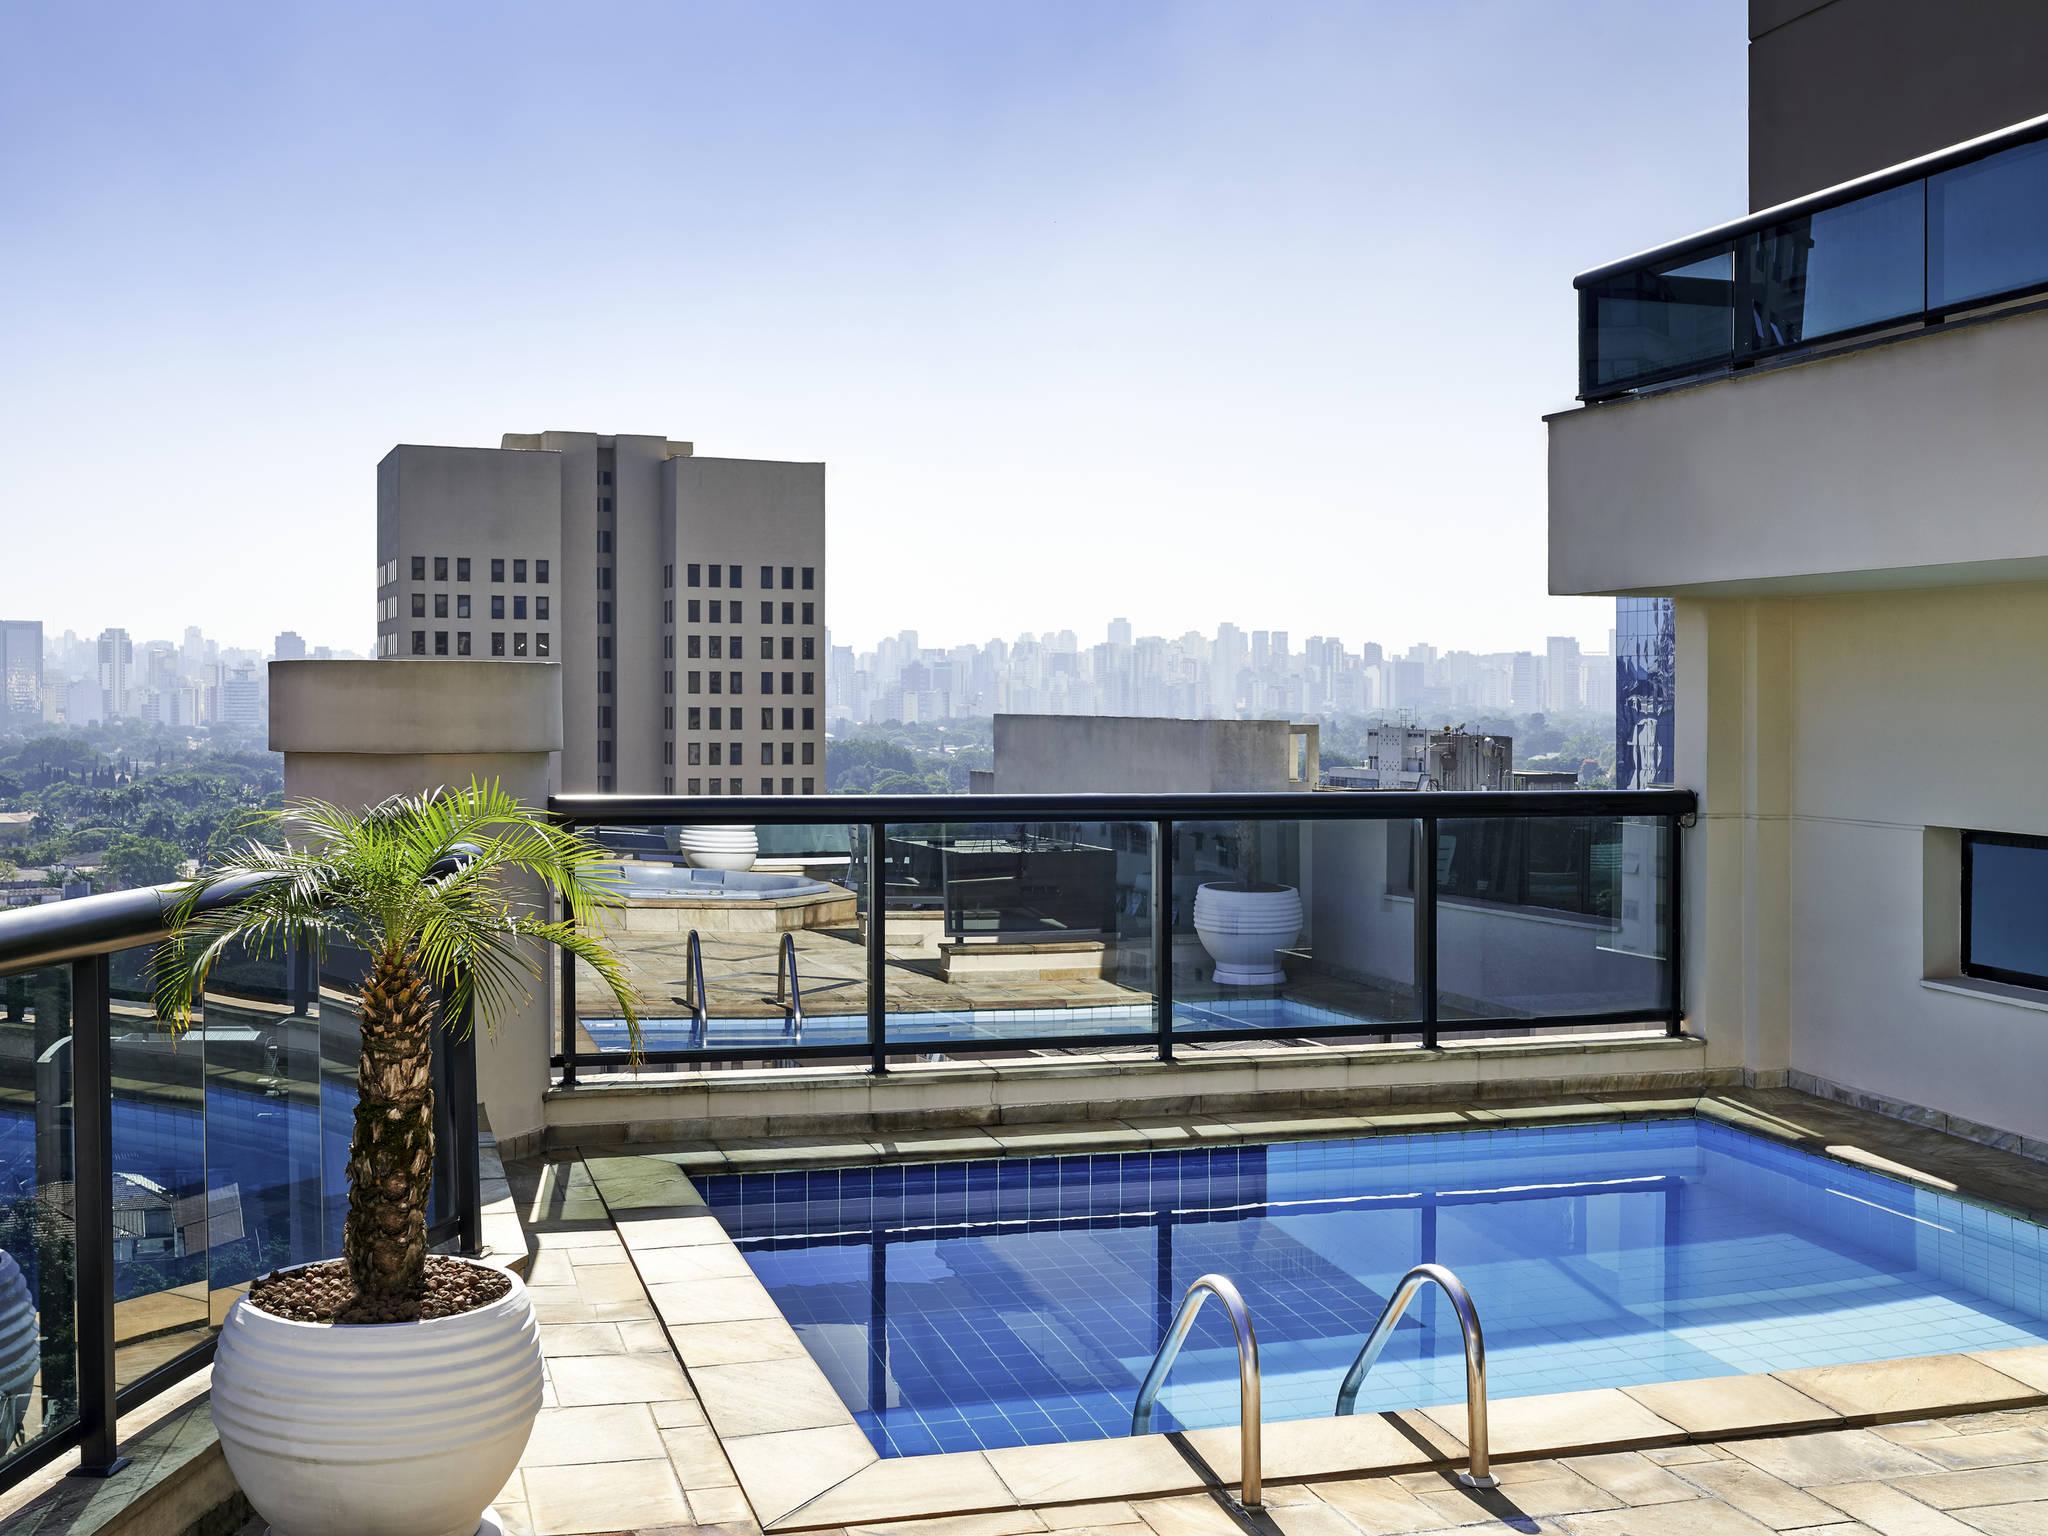 Hotell – Lägenhetshotellet Adagio São Paulo Itaim Bibi